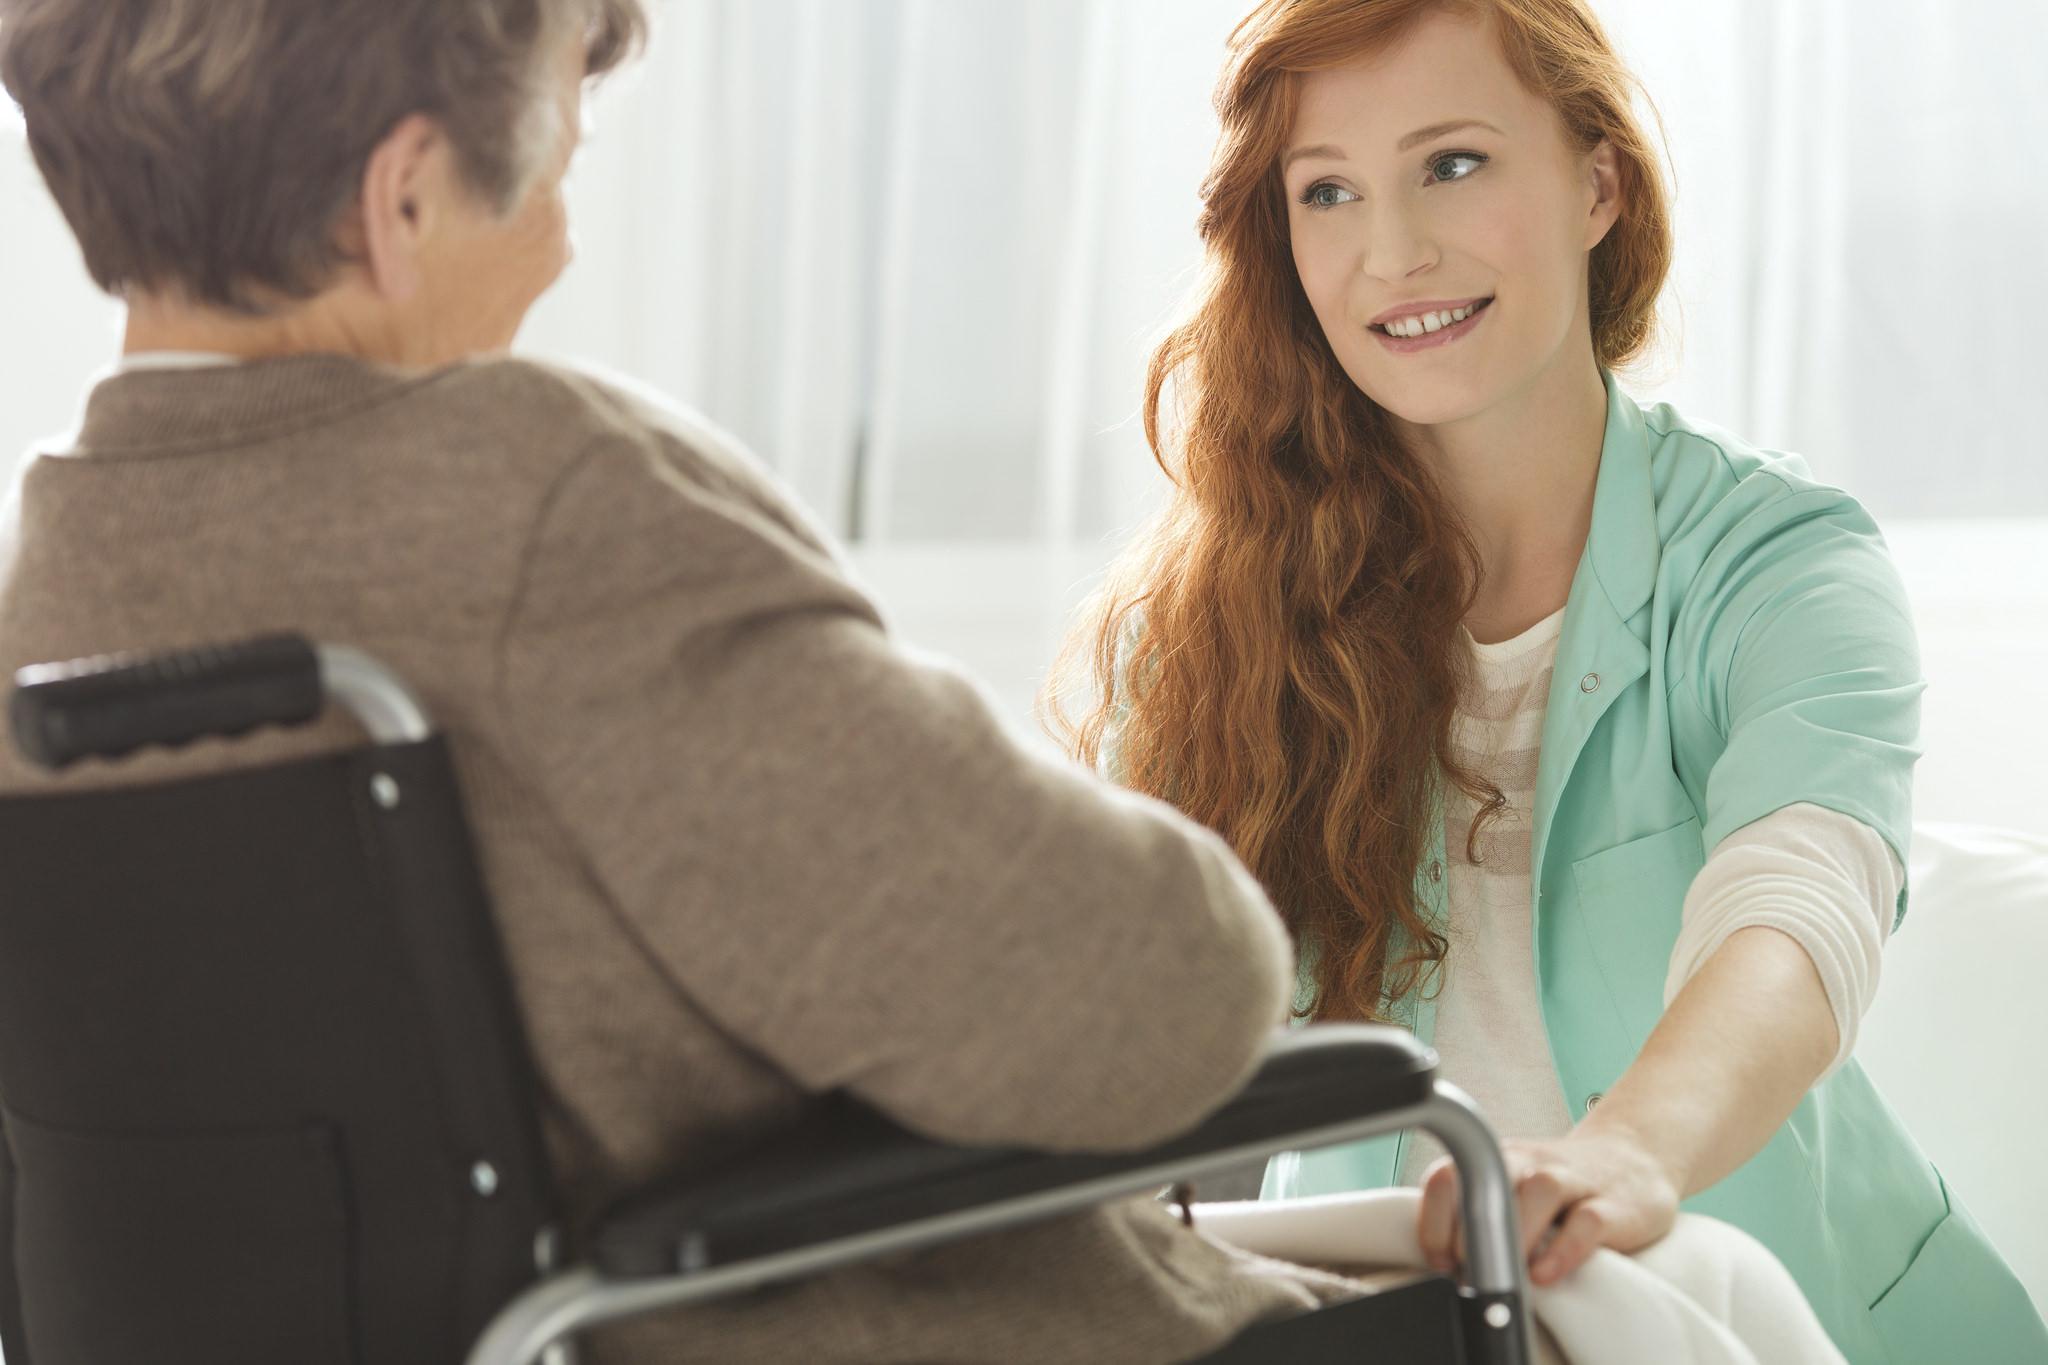 Alzheimer's & Dementia Care - Home Instead